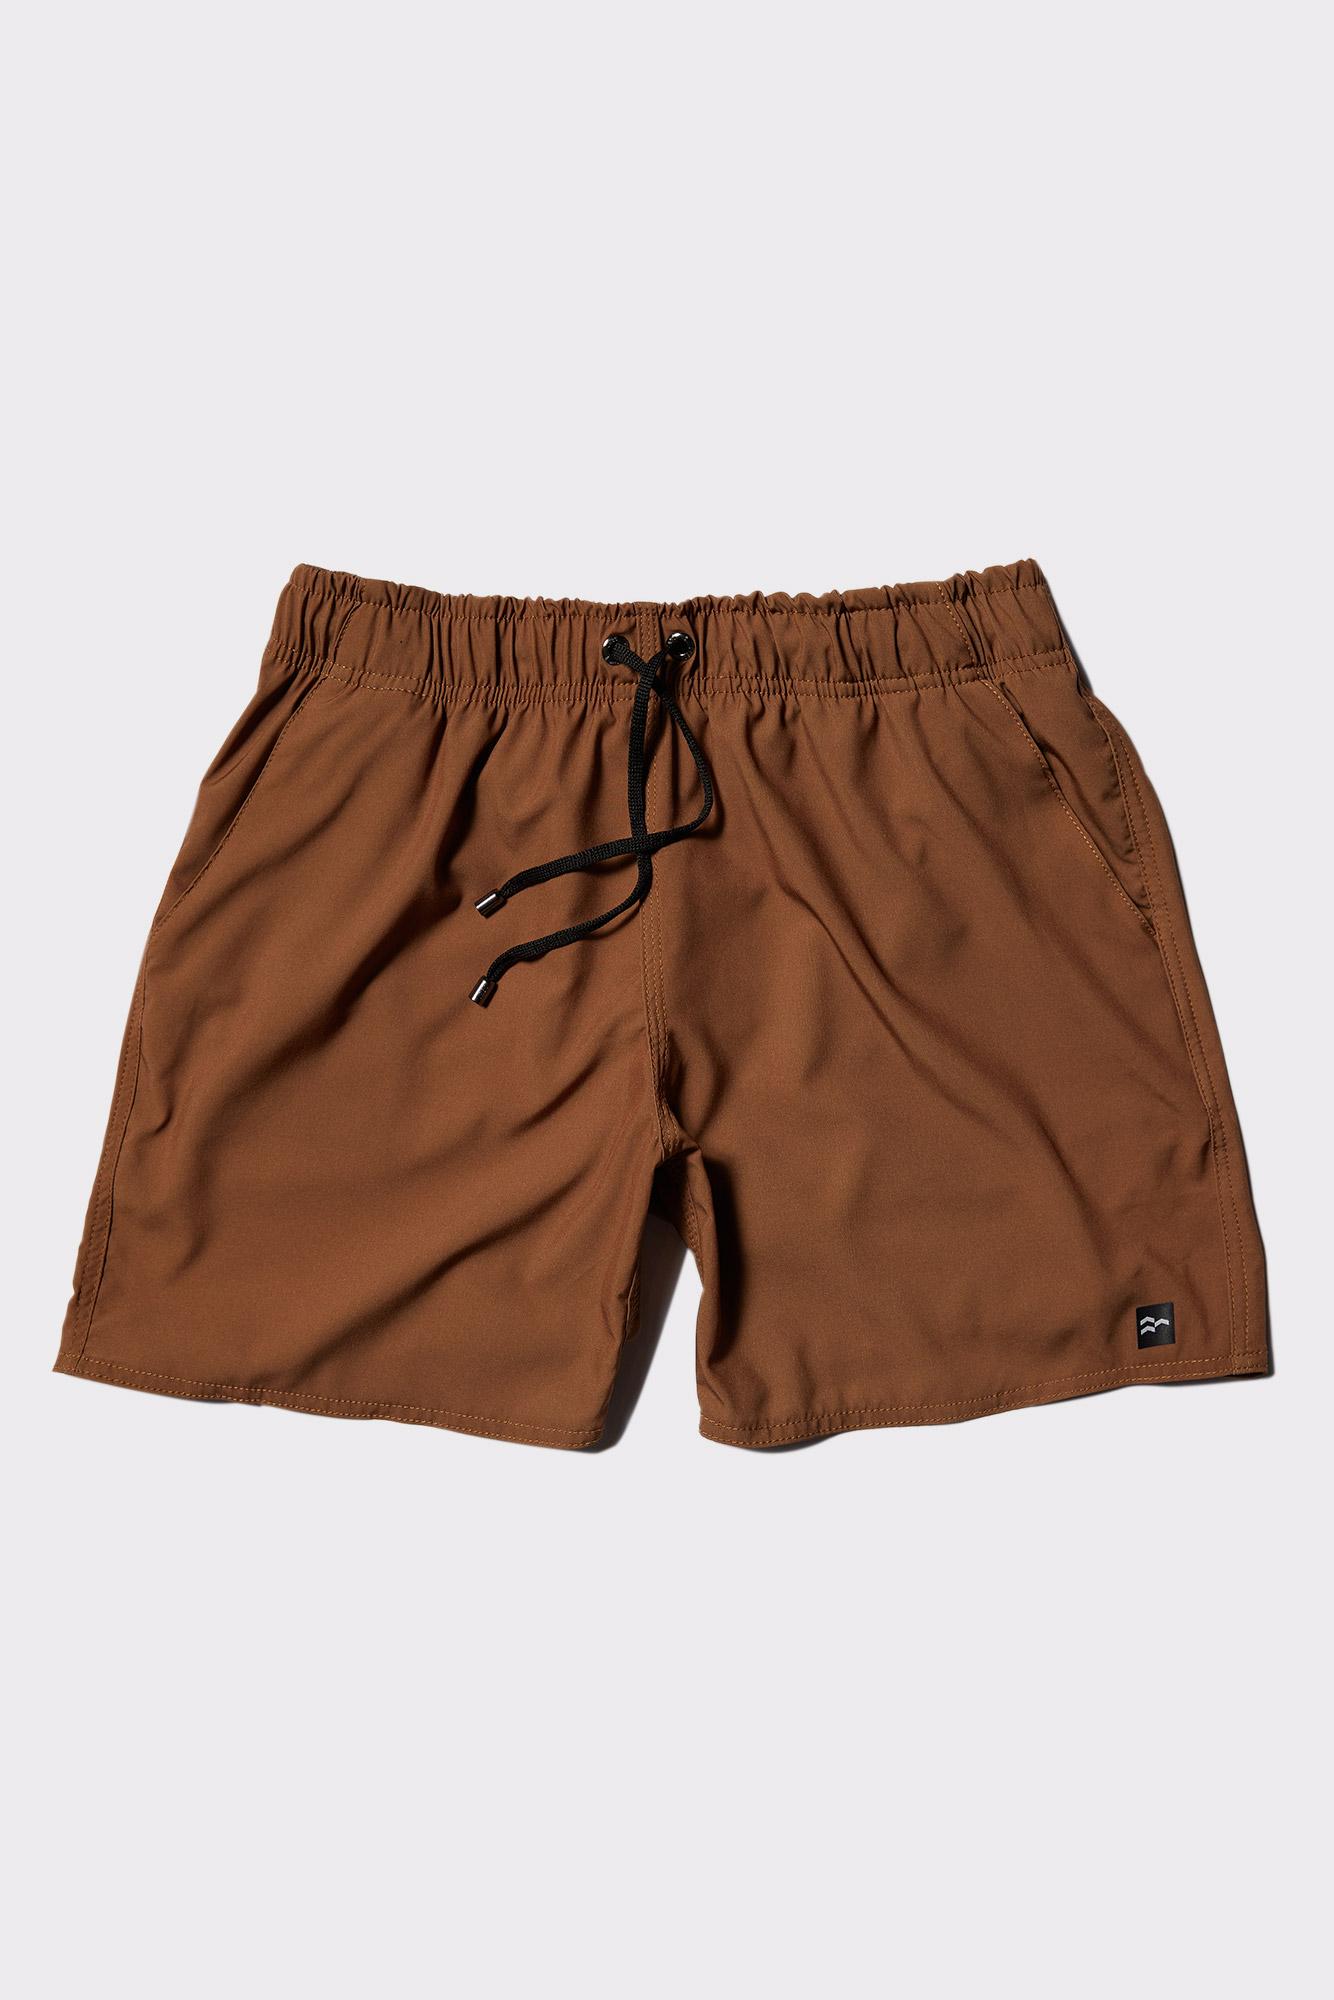 Short Tactel Basic Brown